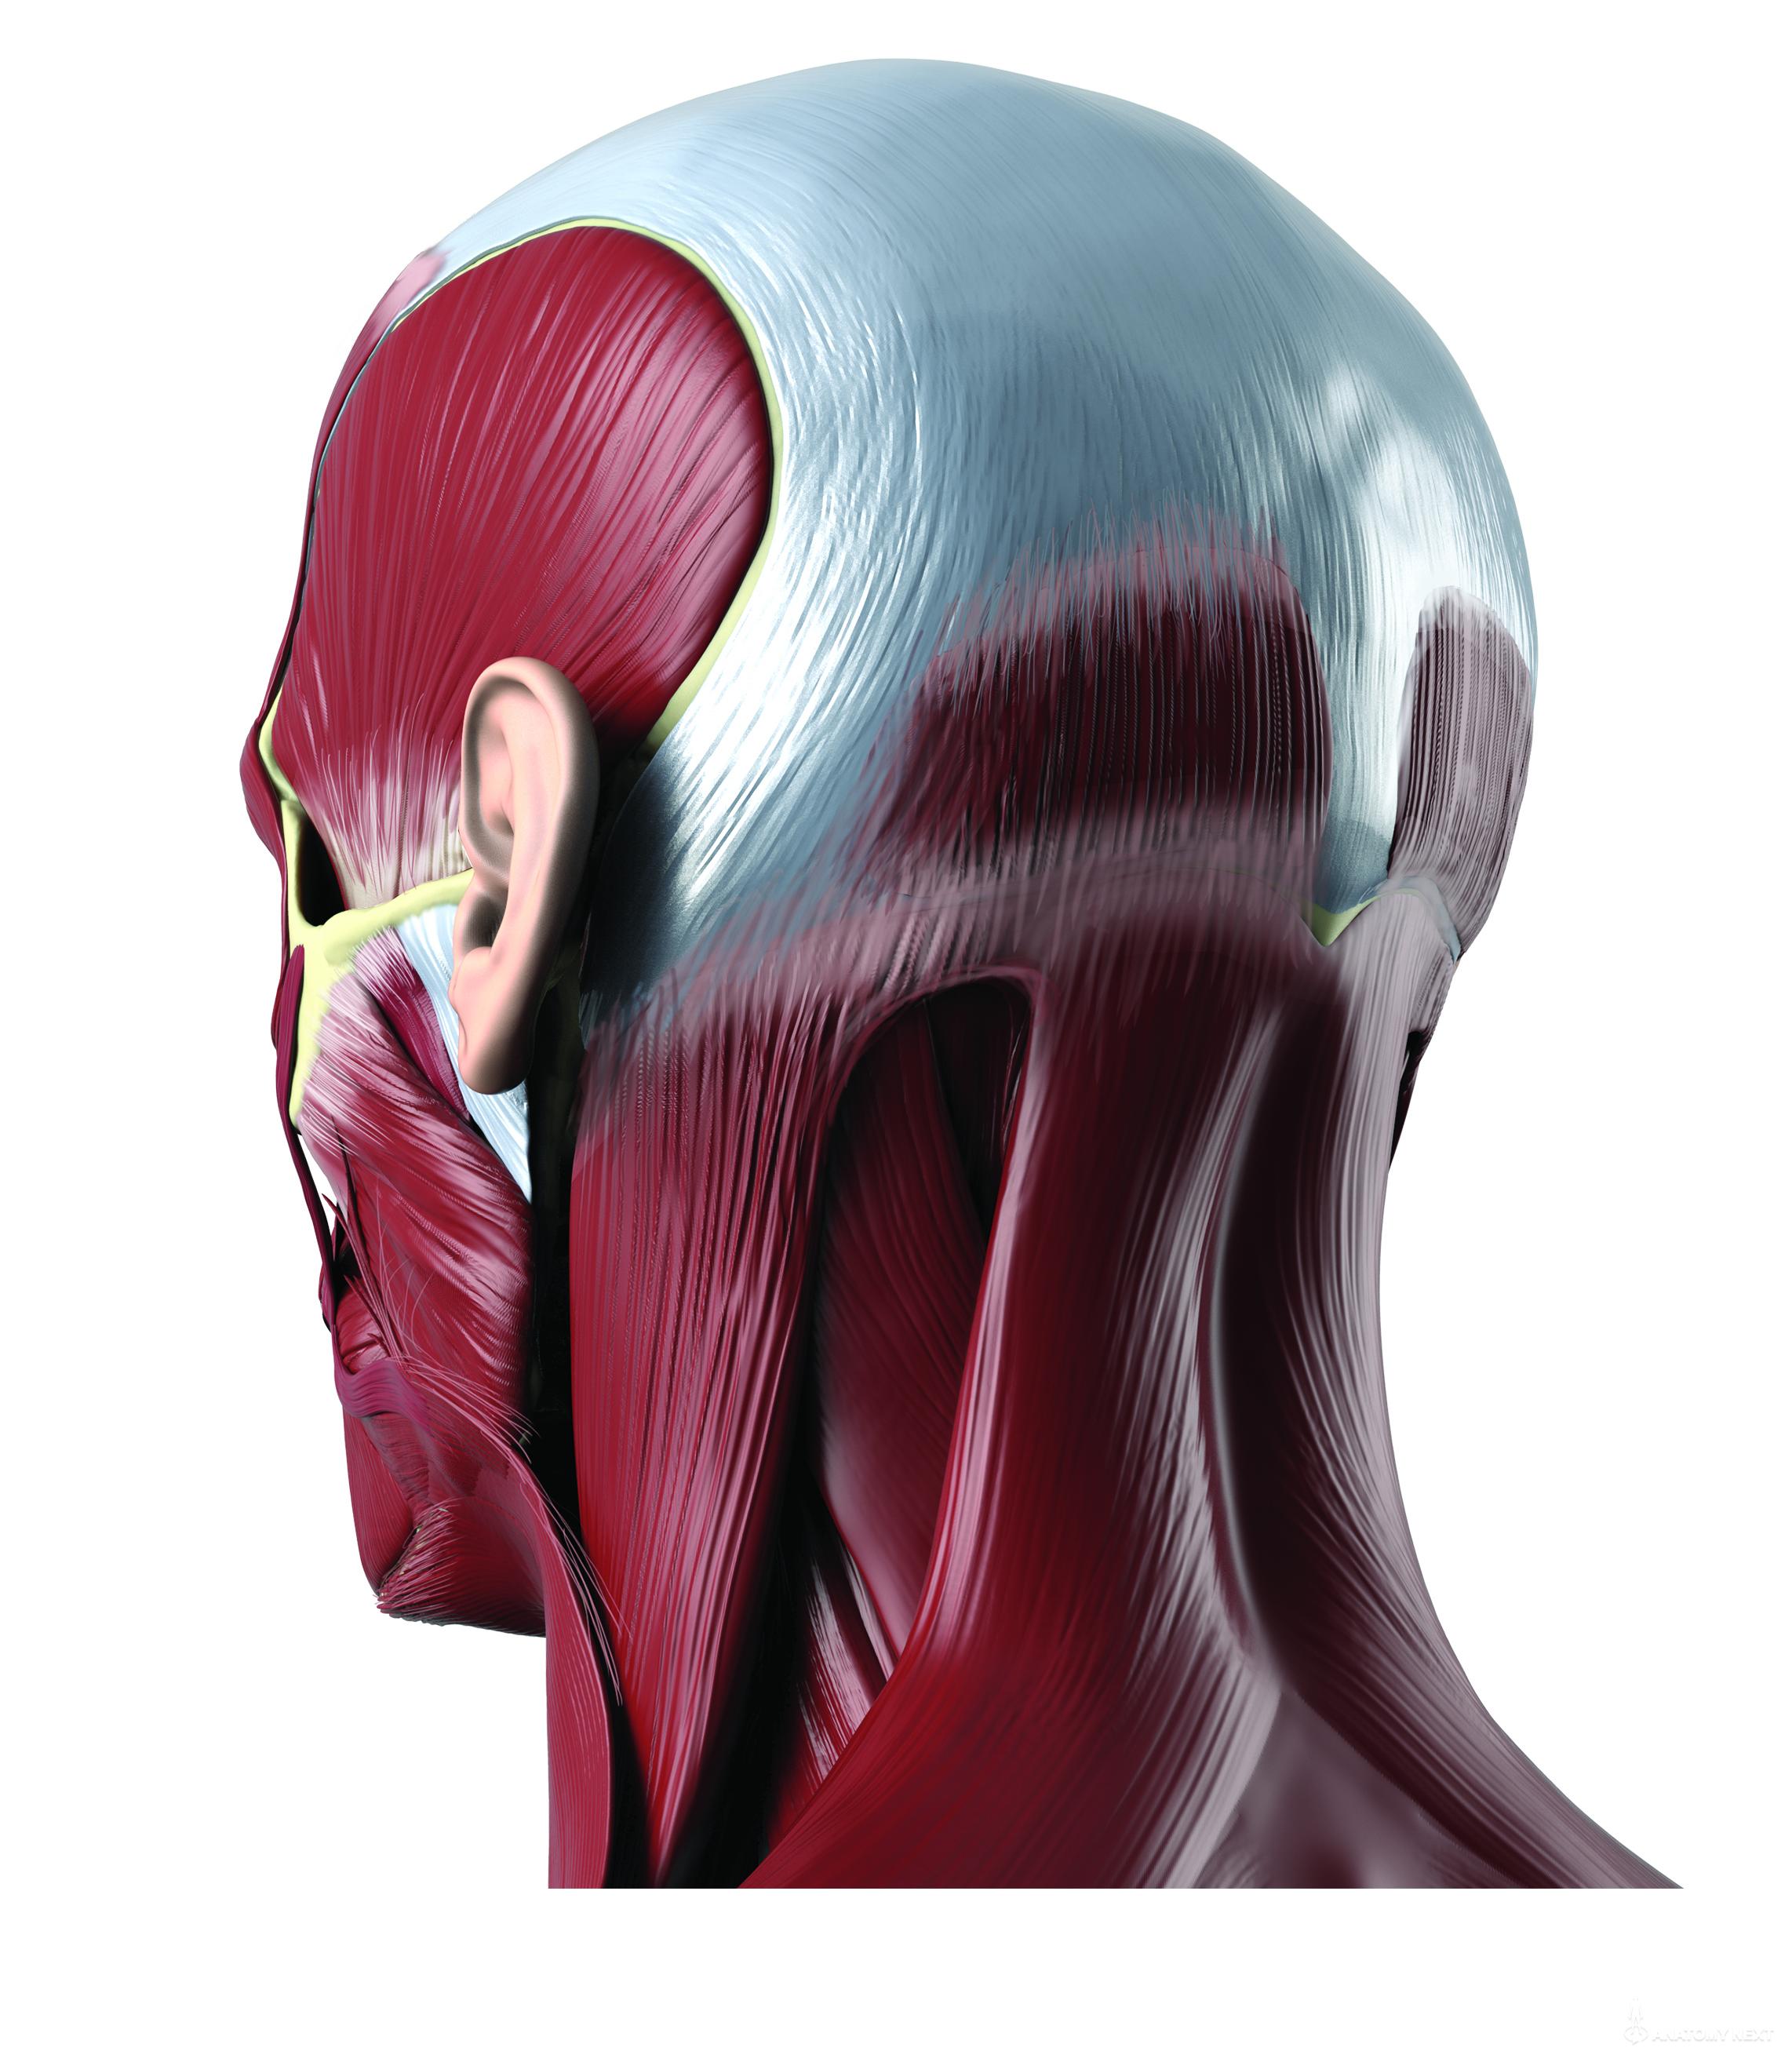 Anatomy Next